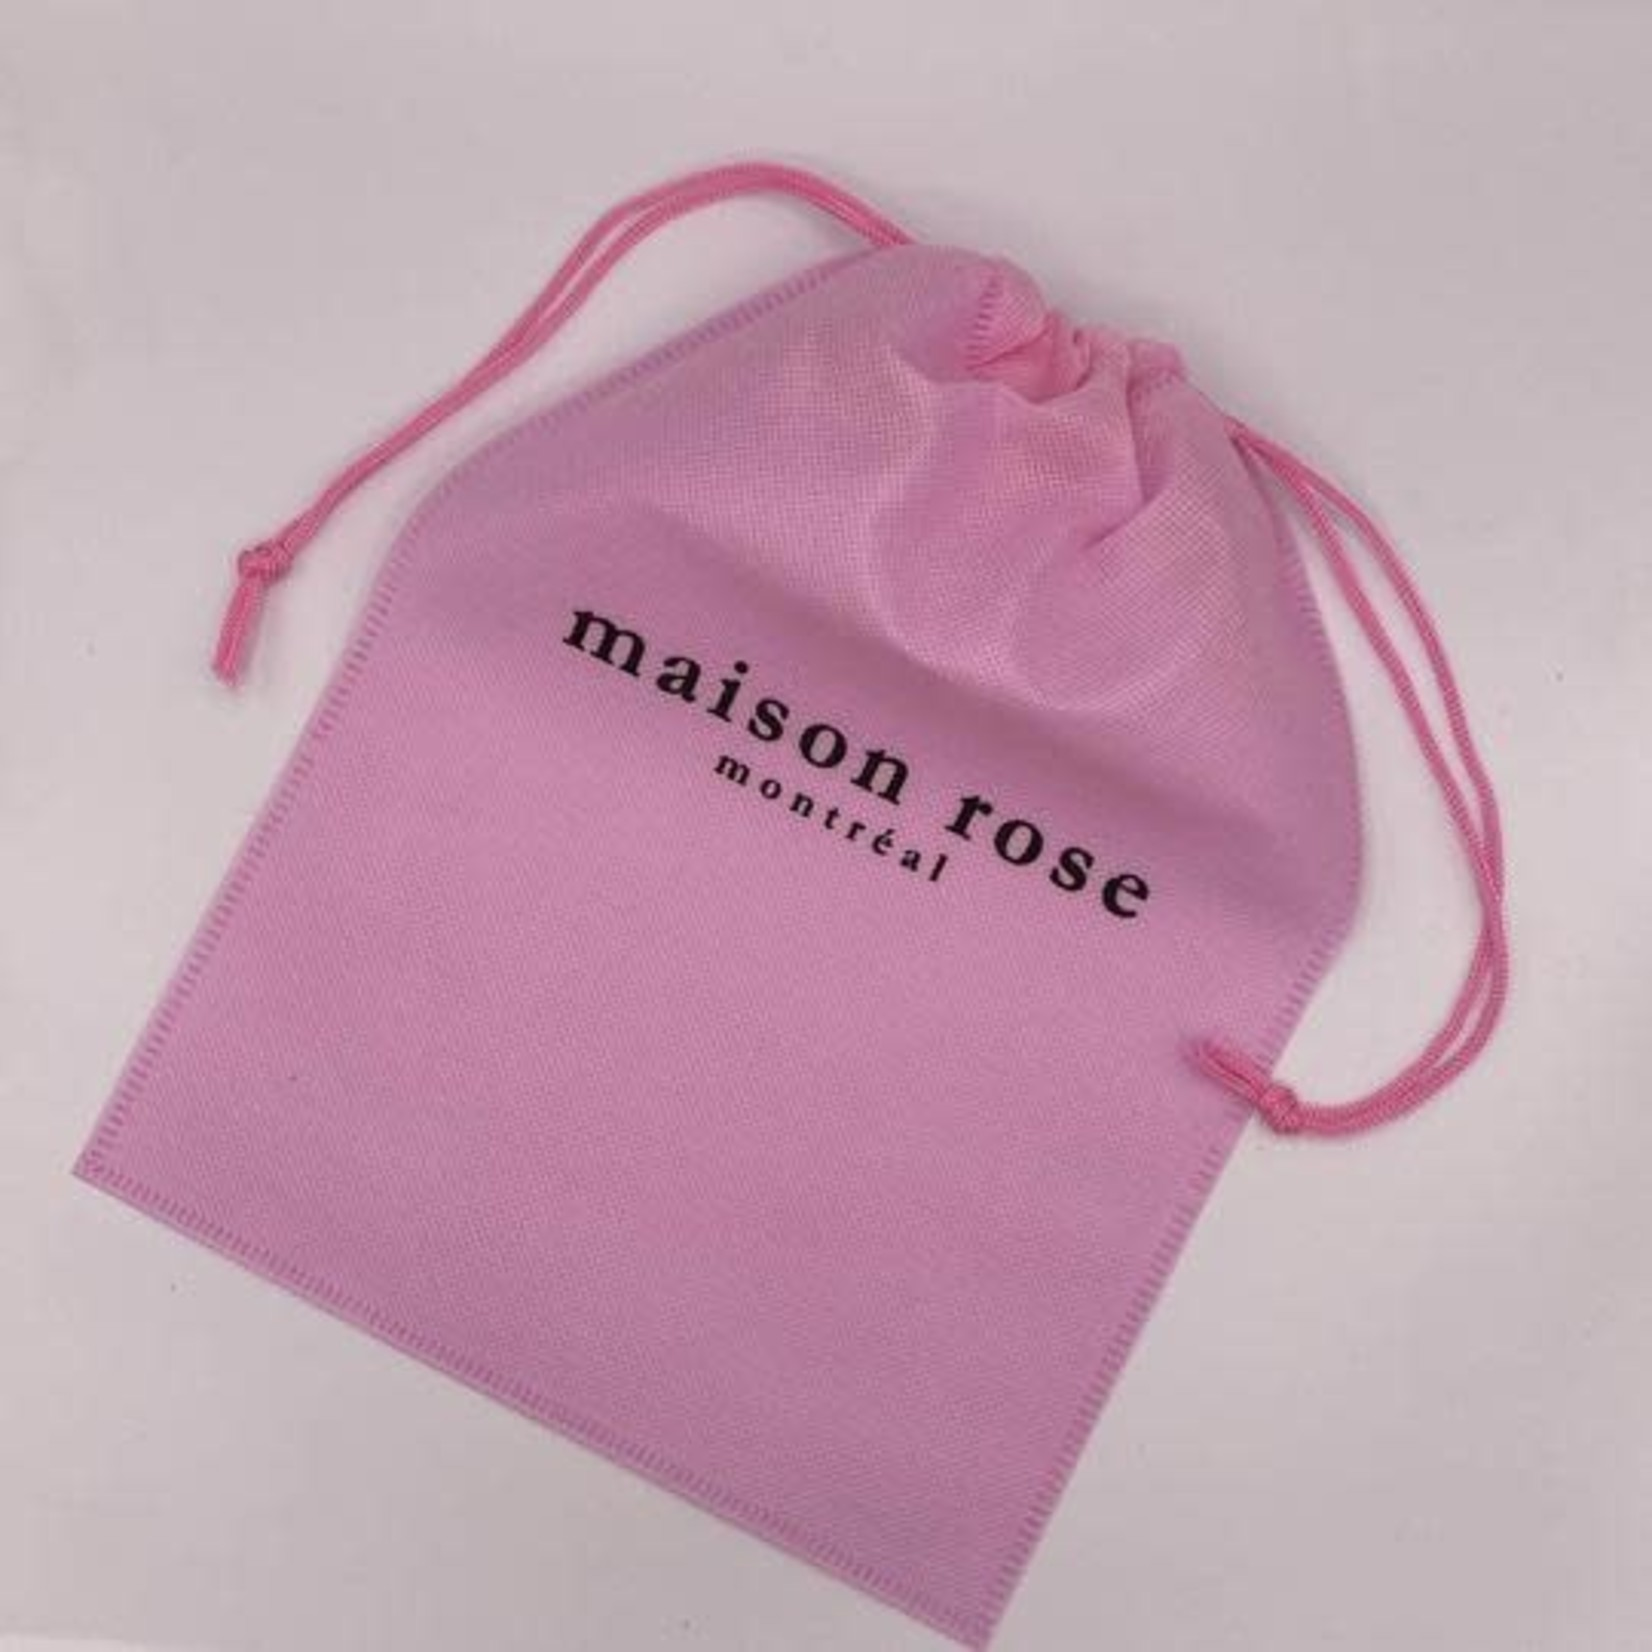 Maison rose - Bombe rose quartz